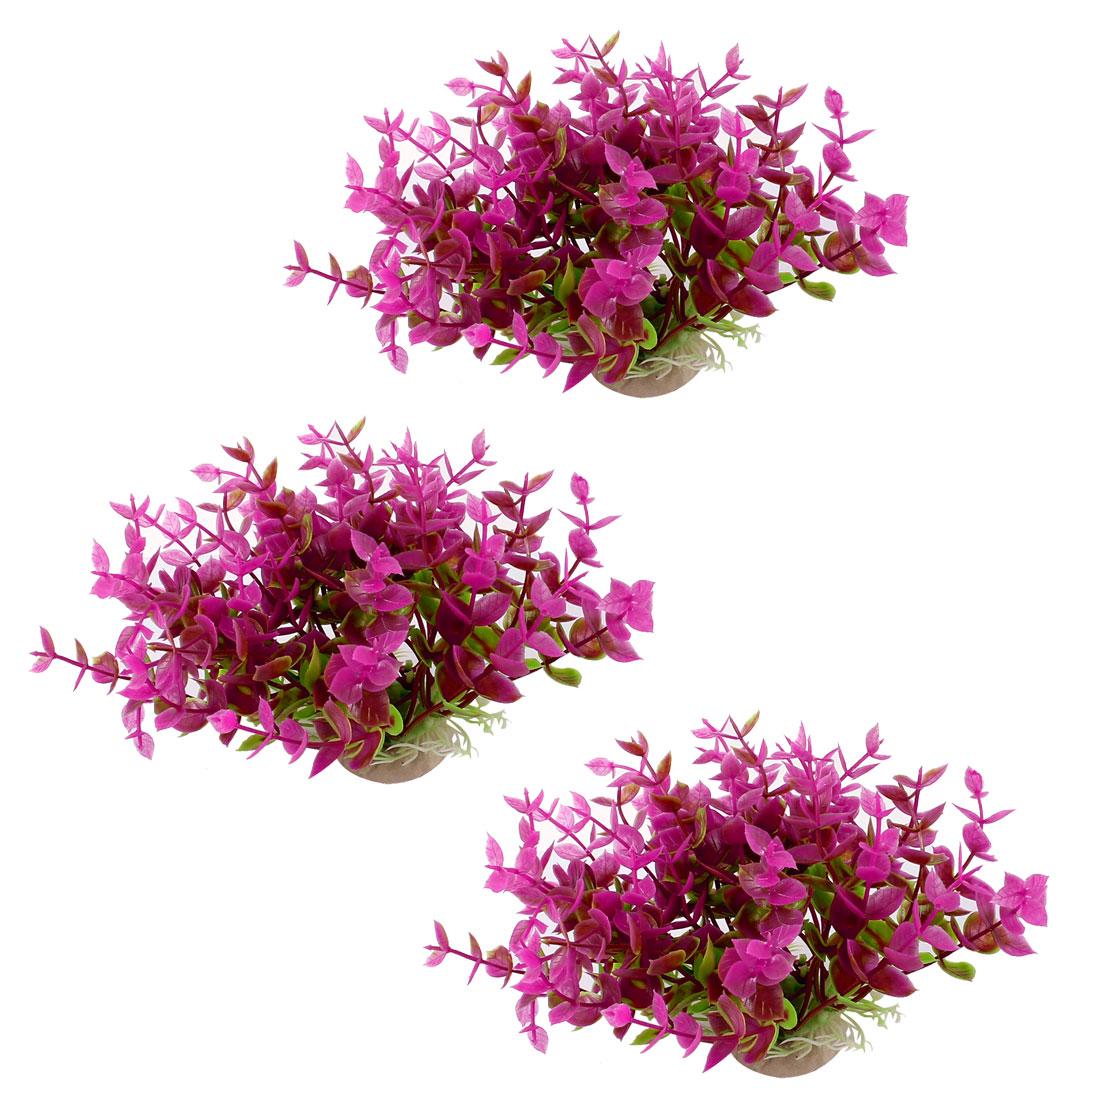 "Aquarium Fish Tank Ornament Landscaping Artificial Emulational Underwater Water Plant Grass Decor Green Fuchsia 4.3"" Height 3pcs"